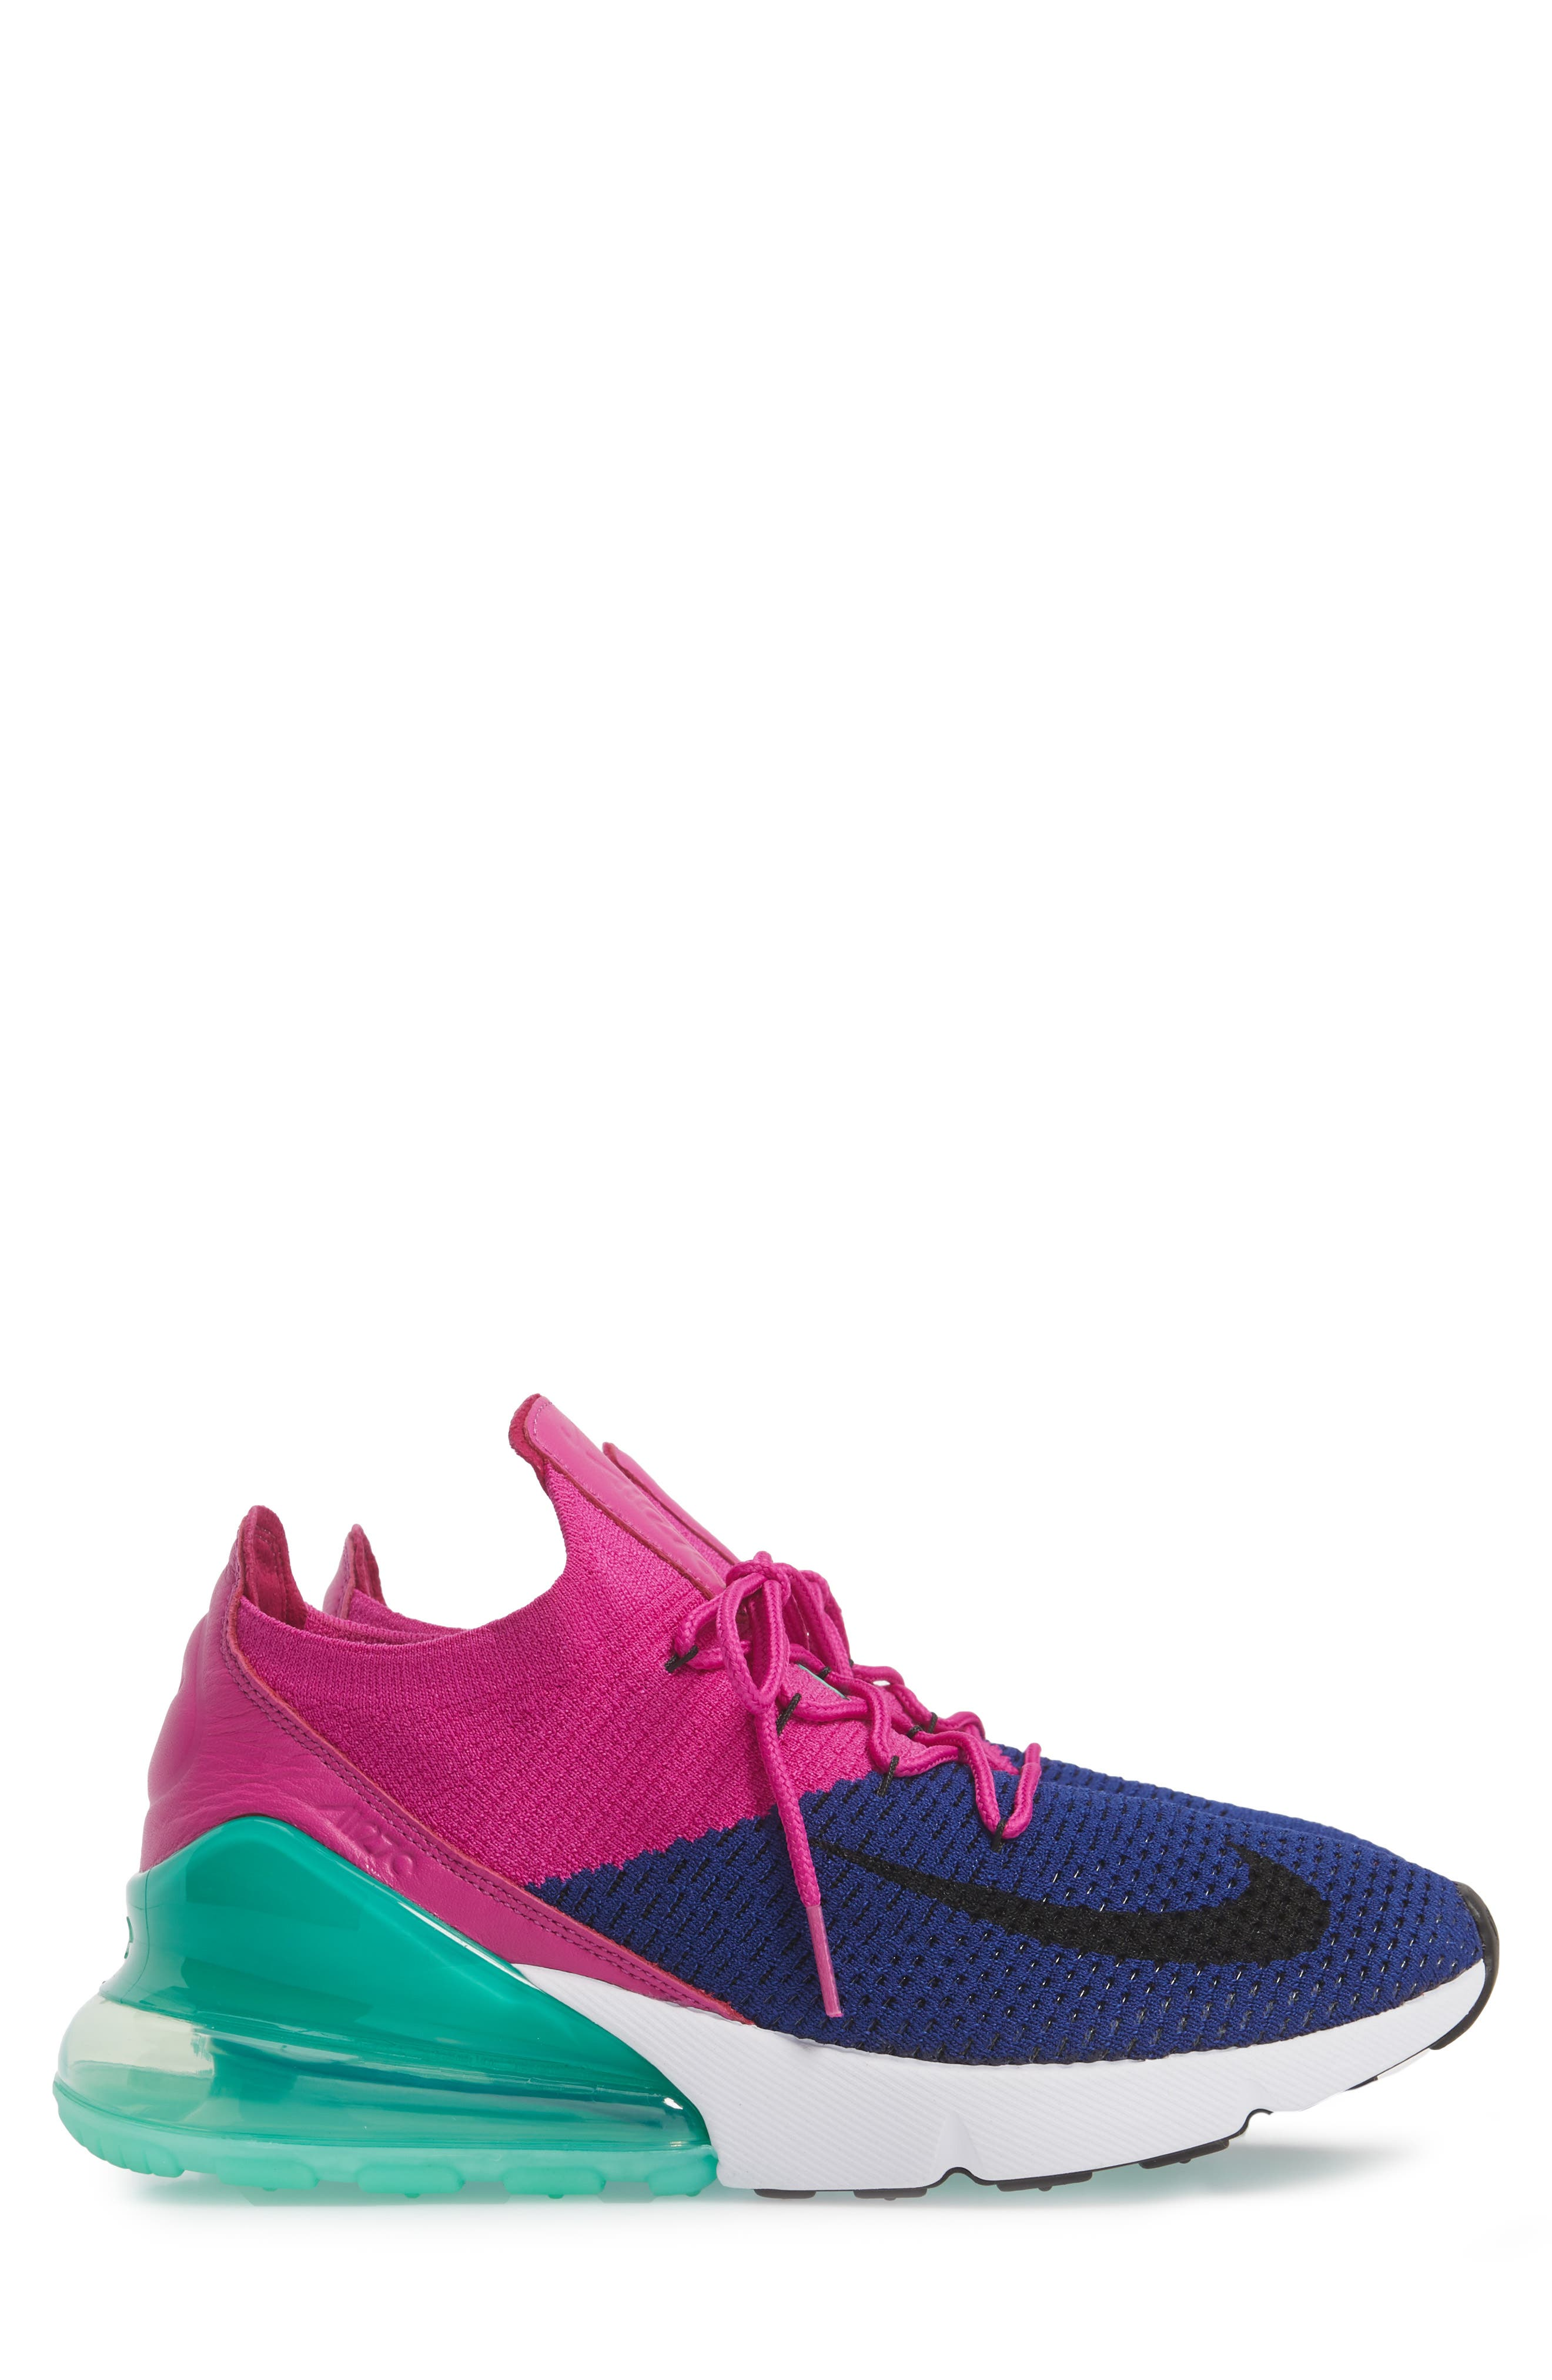 Air Max 270 Flyknit Sneaker,                             Alternate thumbnail 6, color,                             Deep Royal Blue/ Black